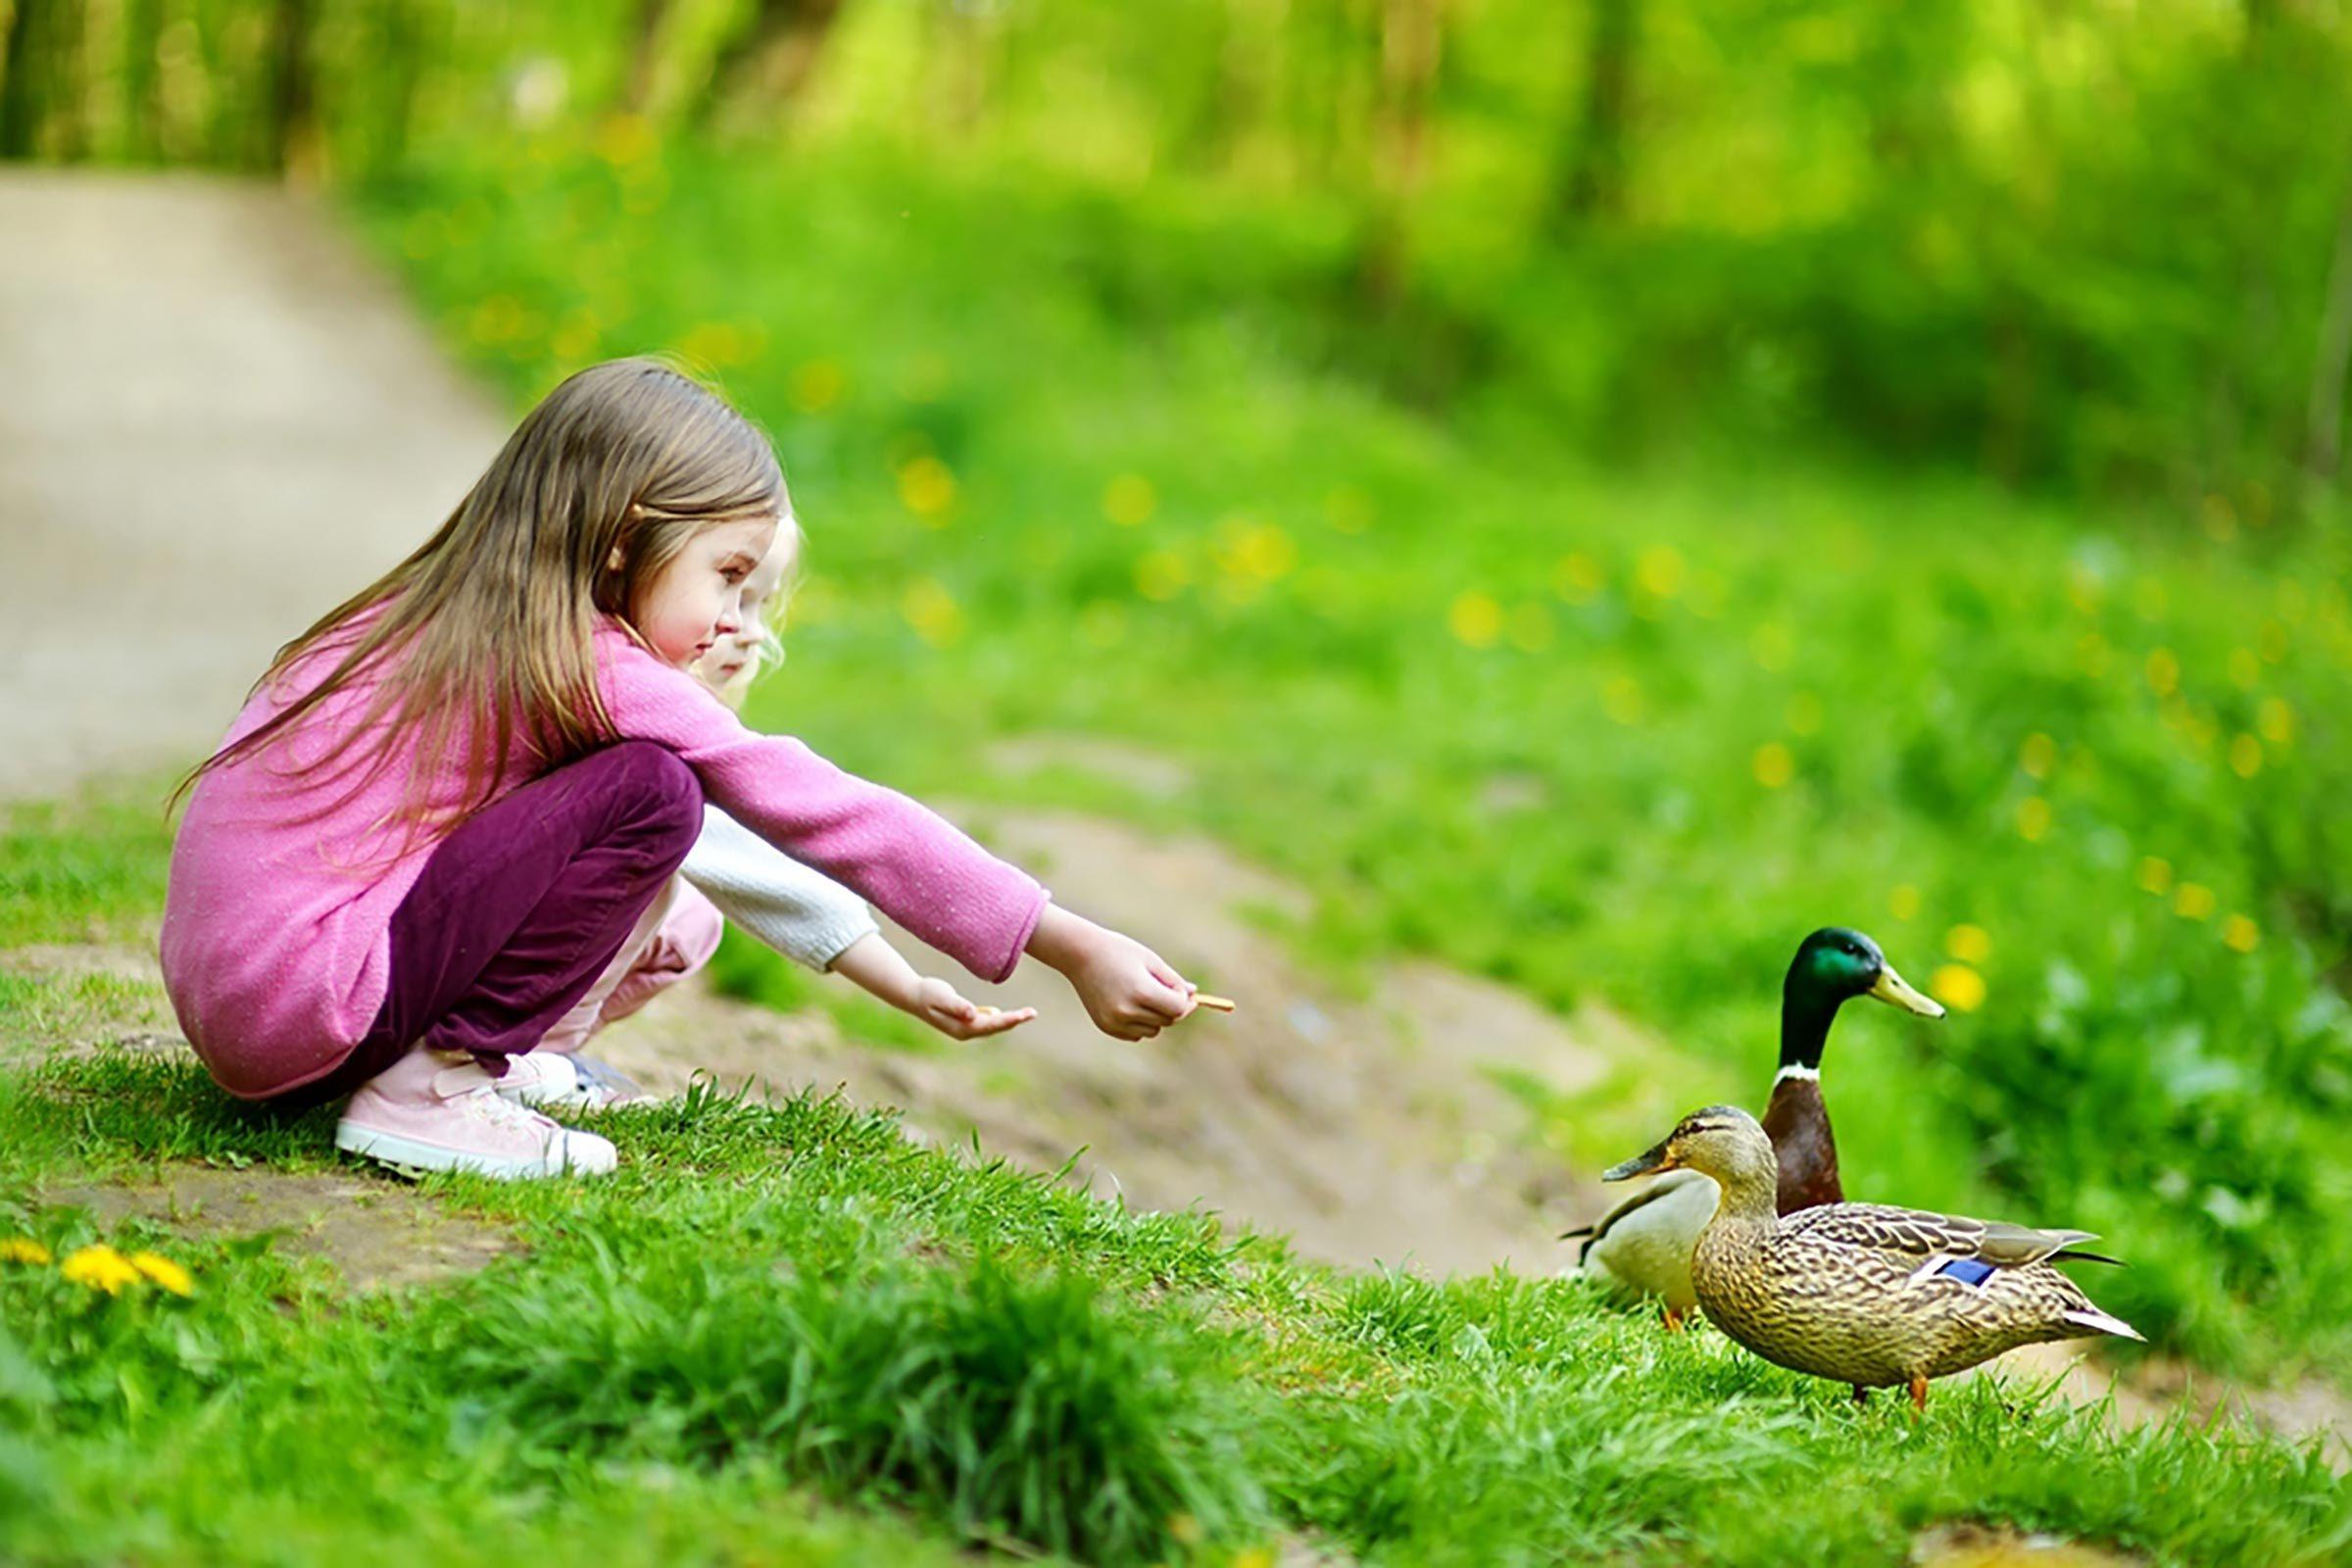 stop feeding ducks bread u2014it could cause them lasting damage